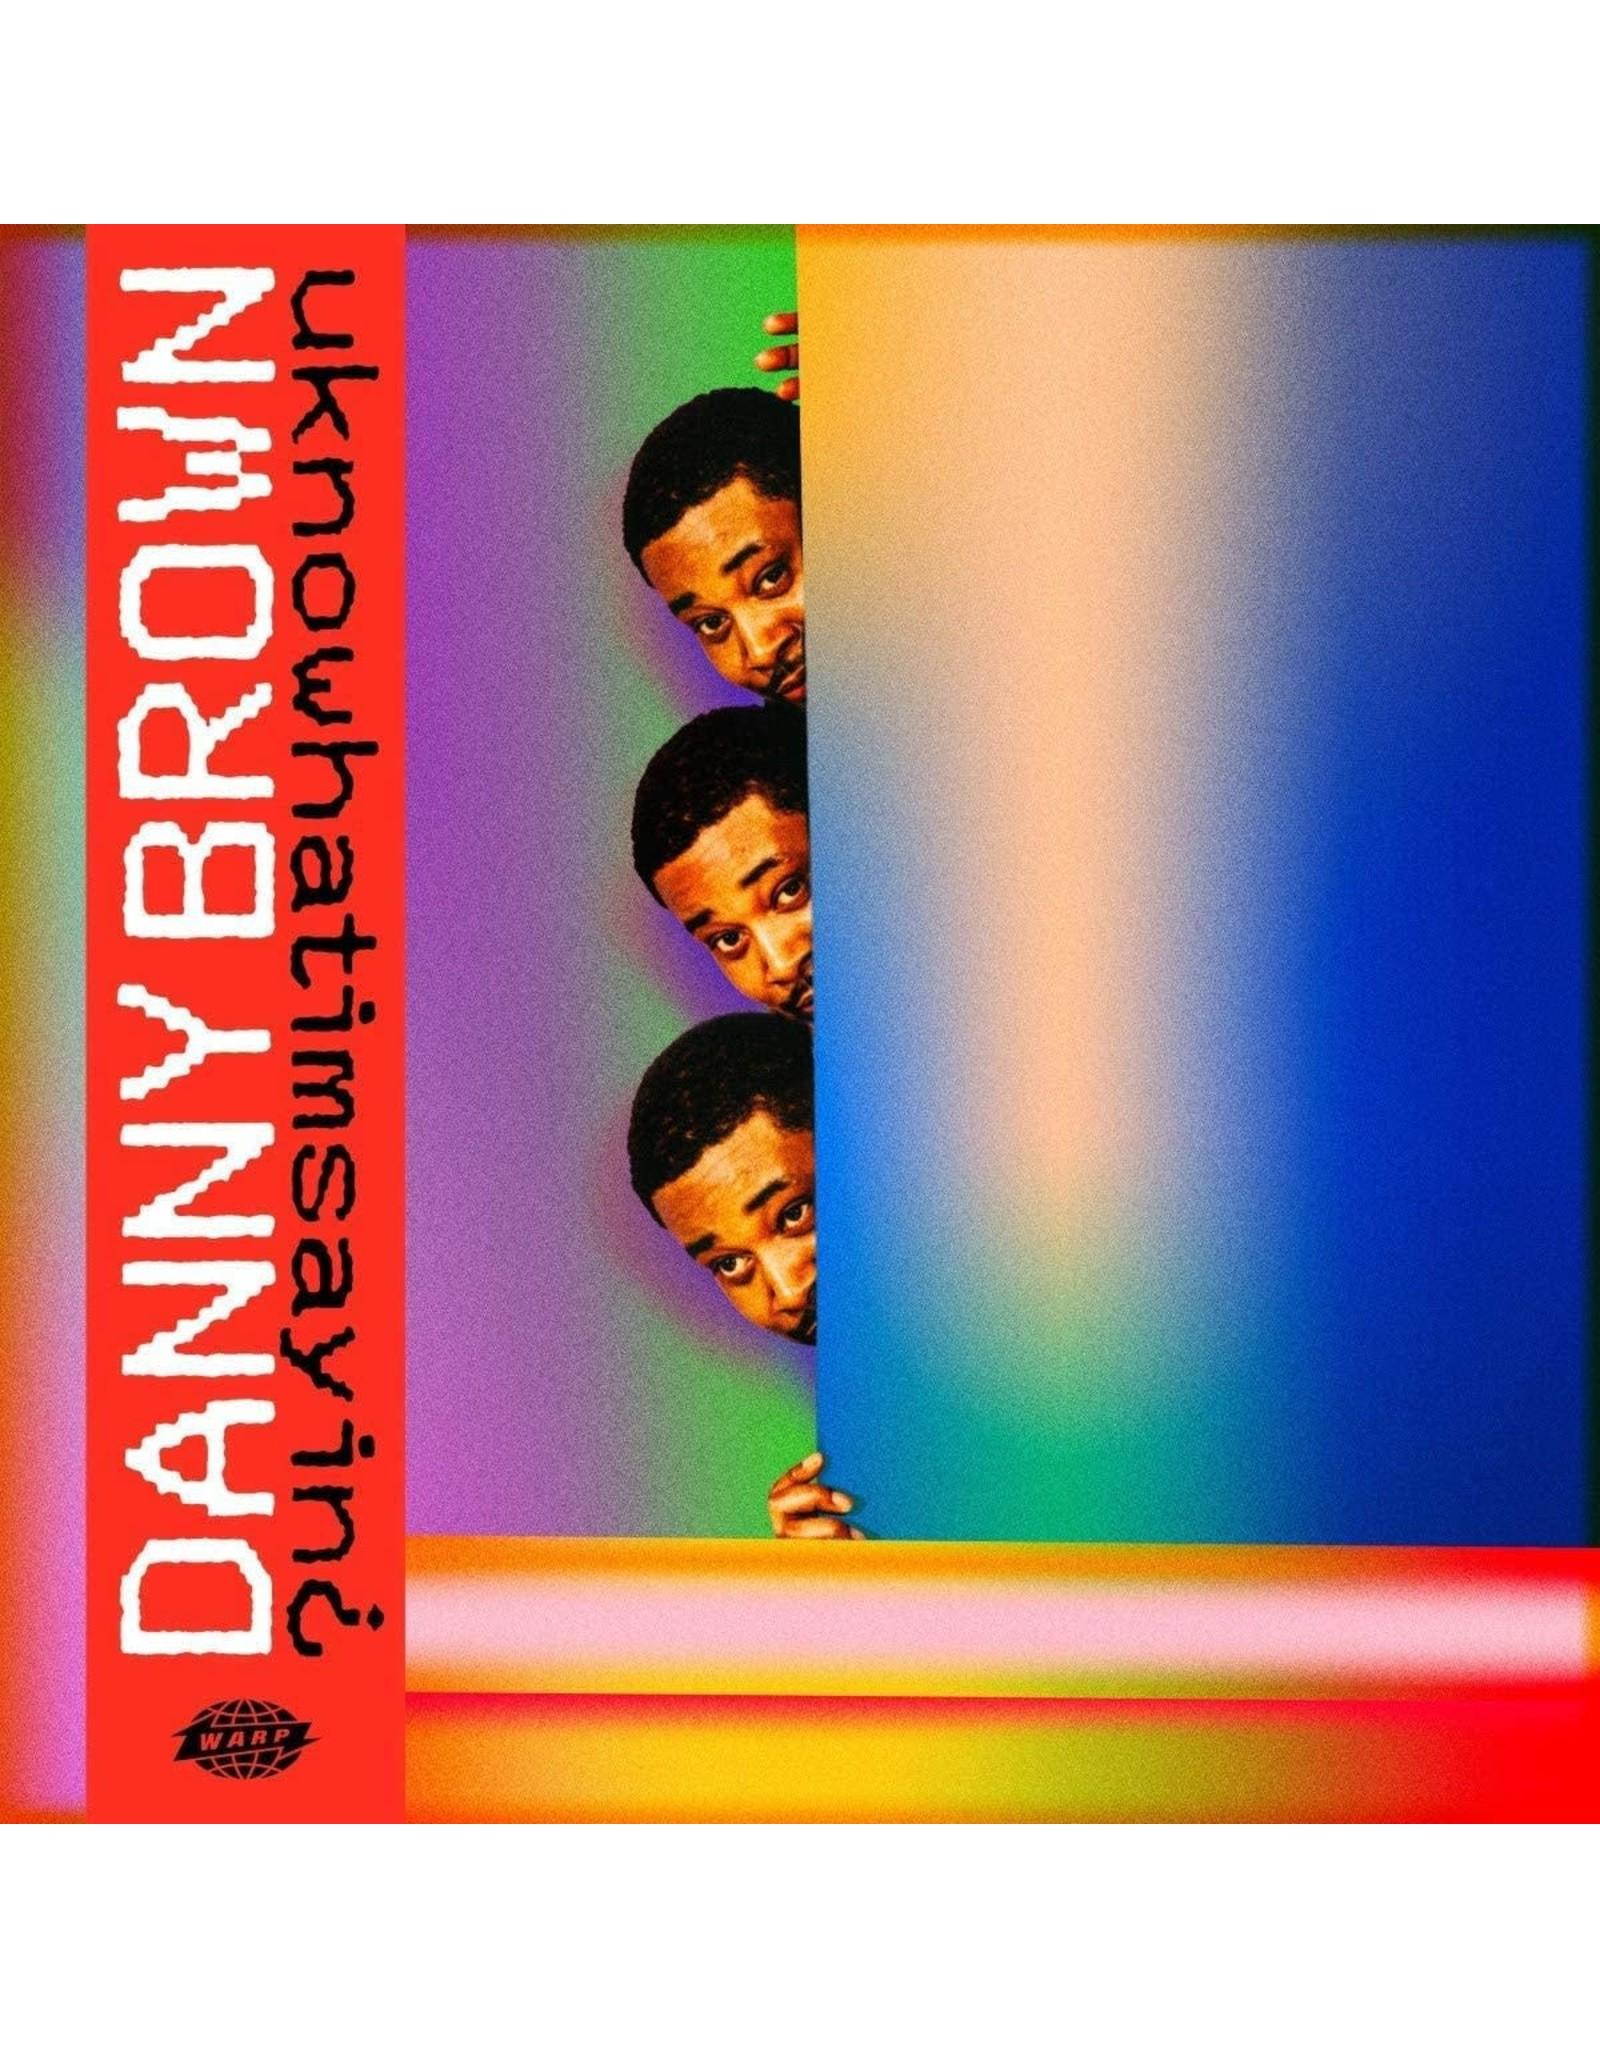 Danny Brown - uknowhatimsayin